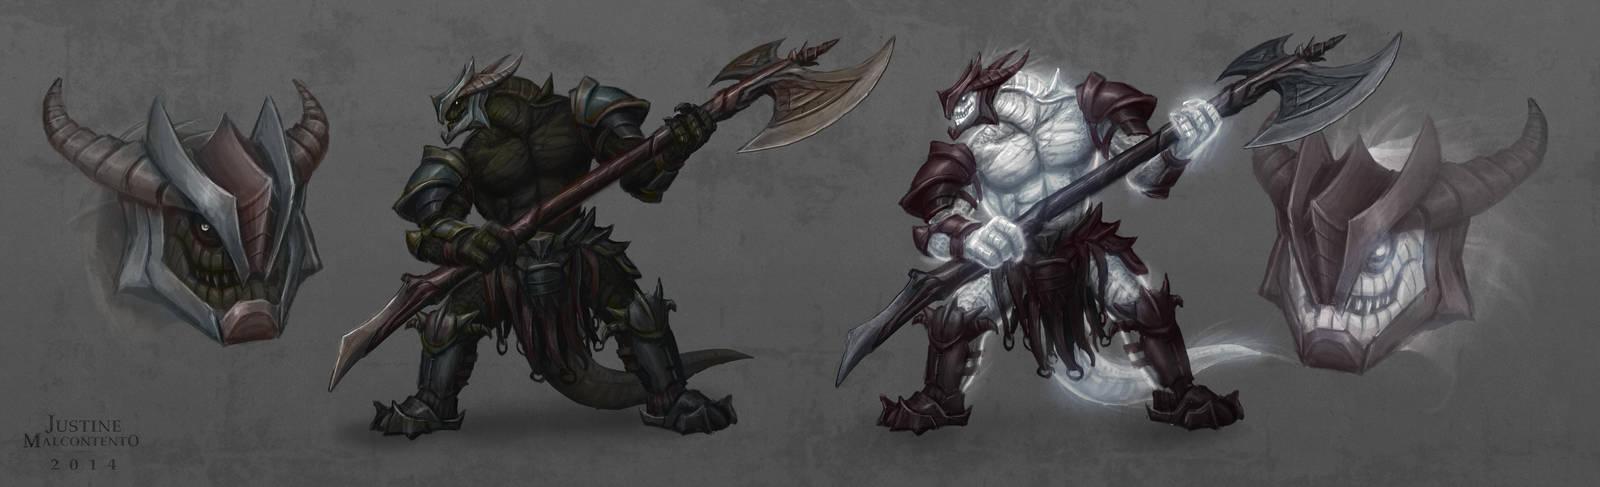 Spectres : Tyrant Warrior by Jujusaurus